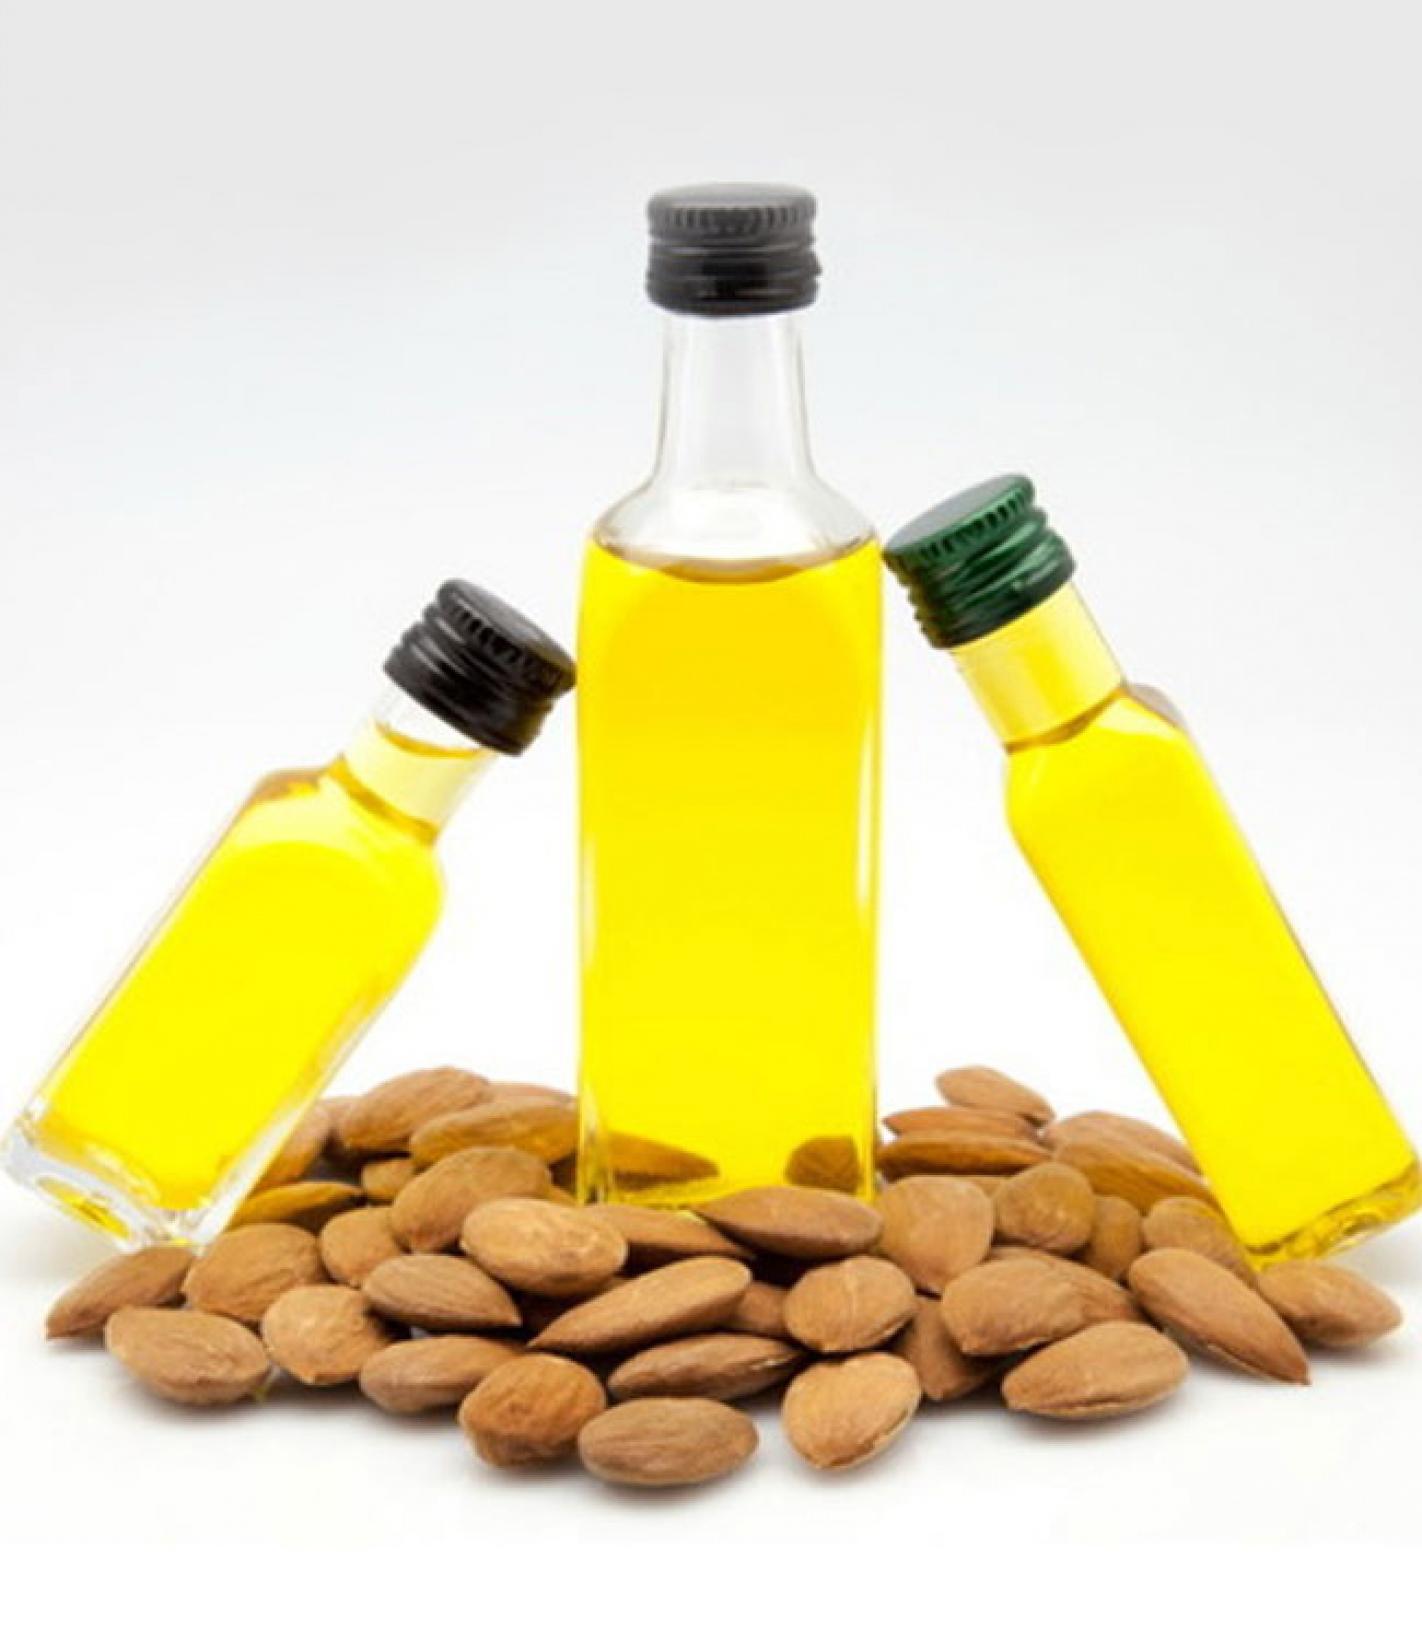 Almond-oil-mandle